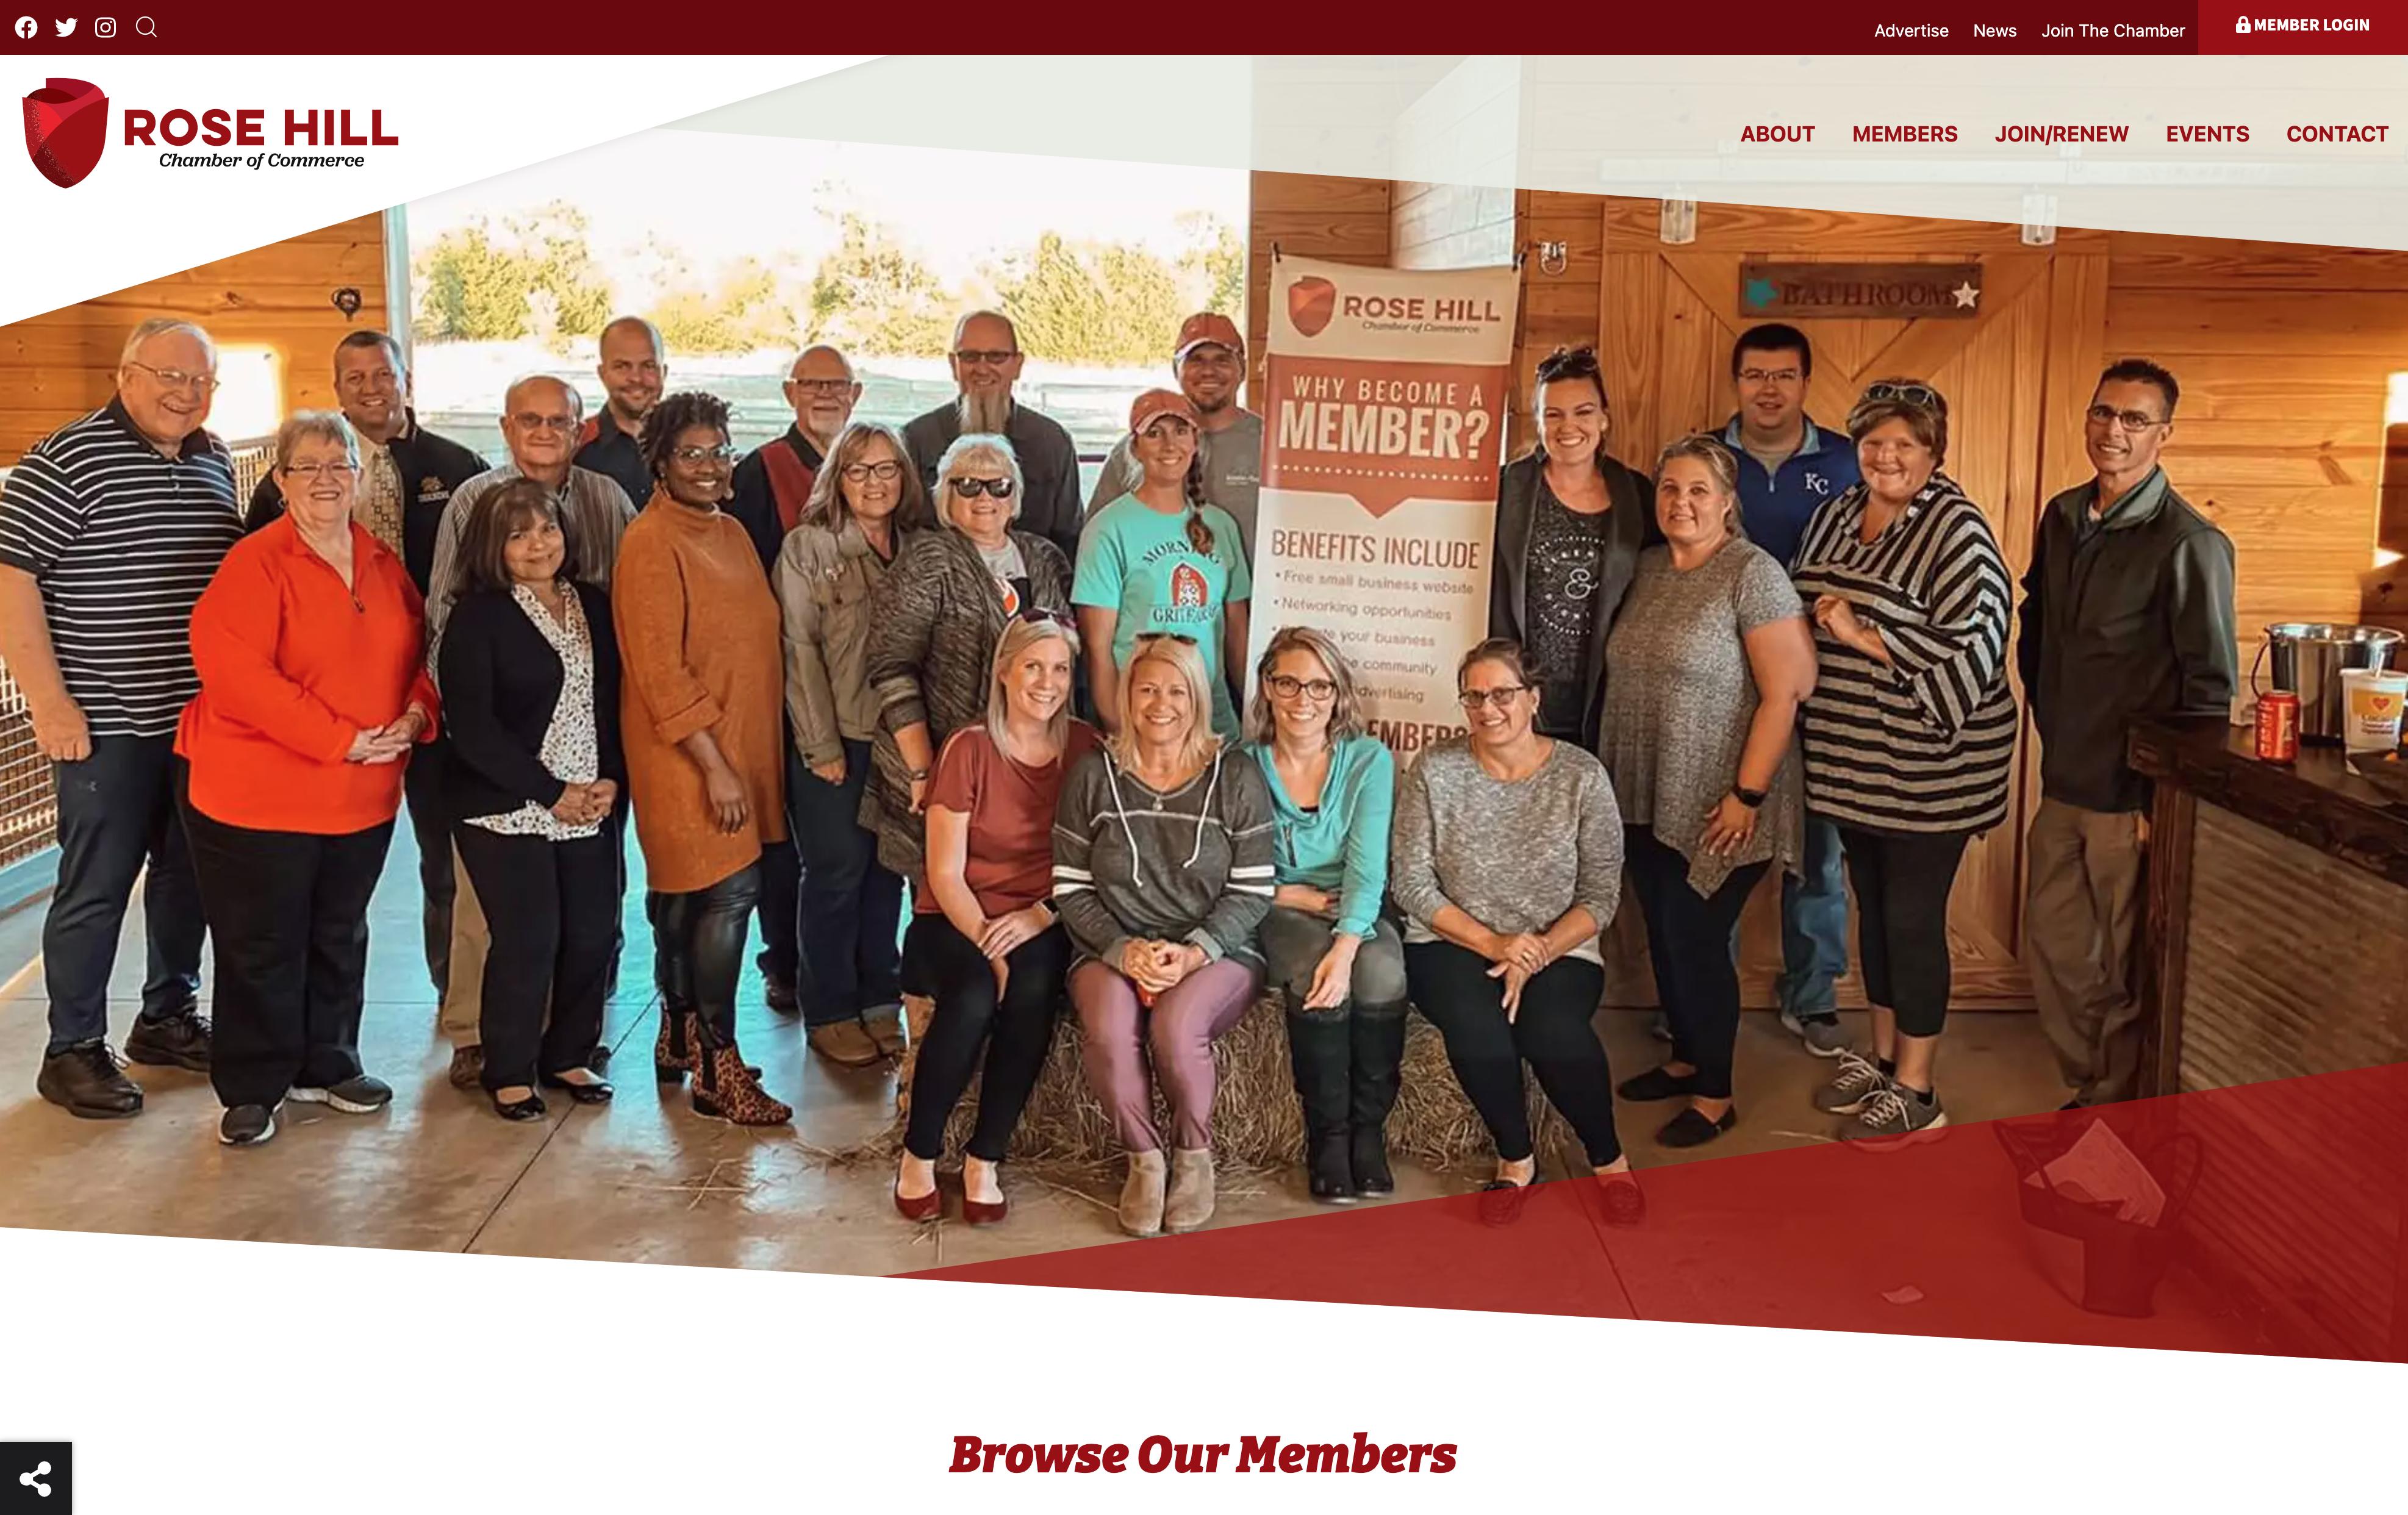 rose hill chamber website